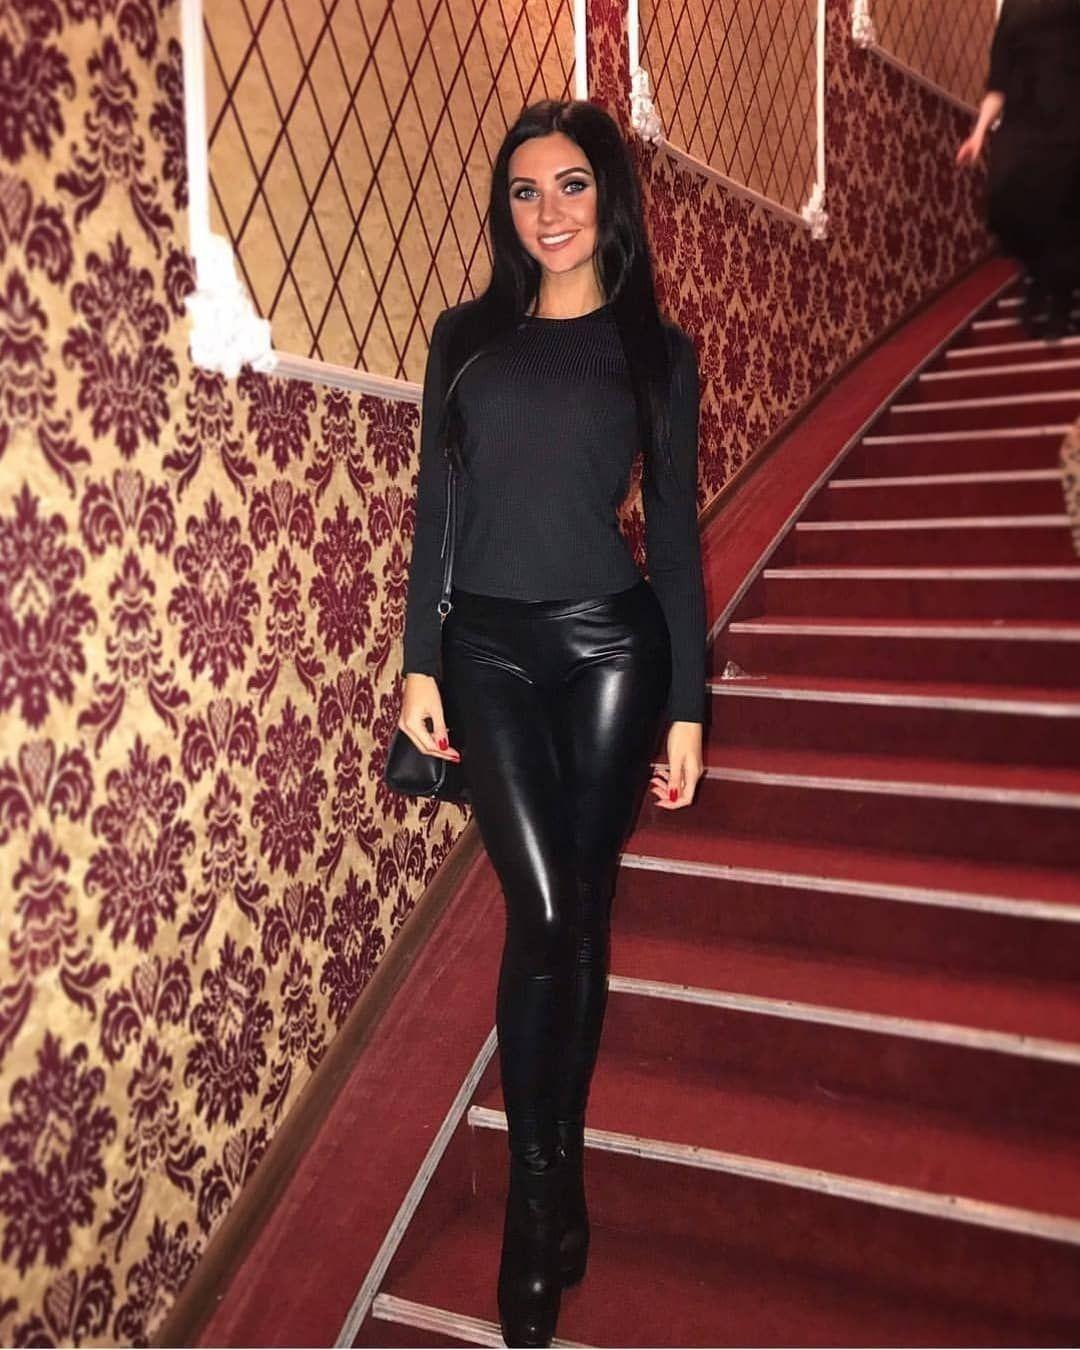 5ffe54eab5c81 Lederlady ❤ Sexy Leggings Outfit, Leather Pants Outfit, Shiny Leggings,  Leather Boots